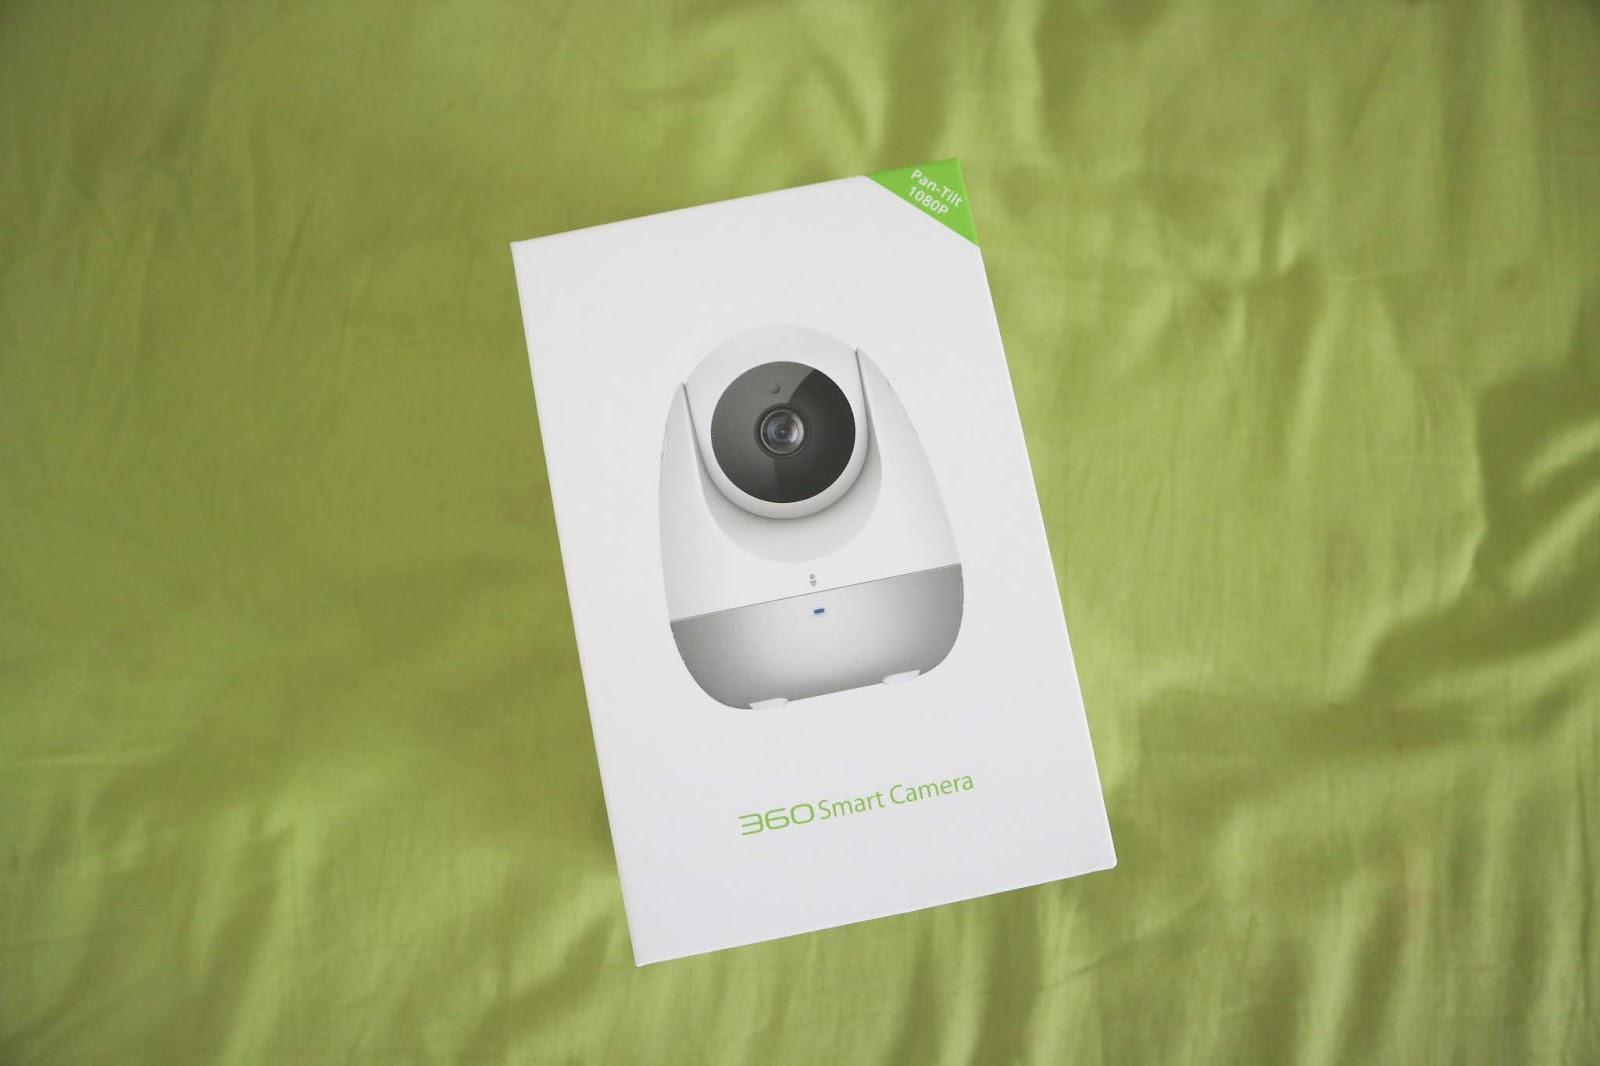 ARTSY FARTSY AVA: Review: Qihoo 360 Smart Camera with CRY